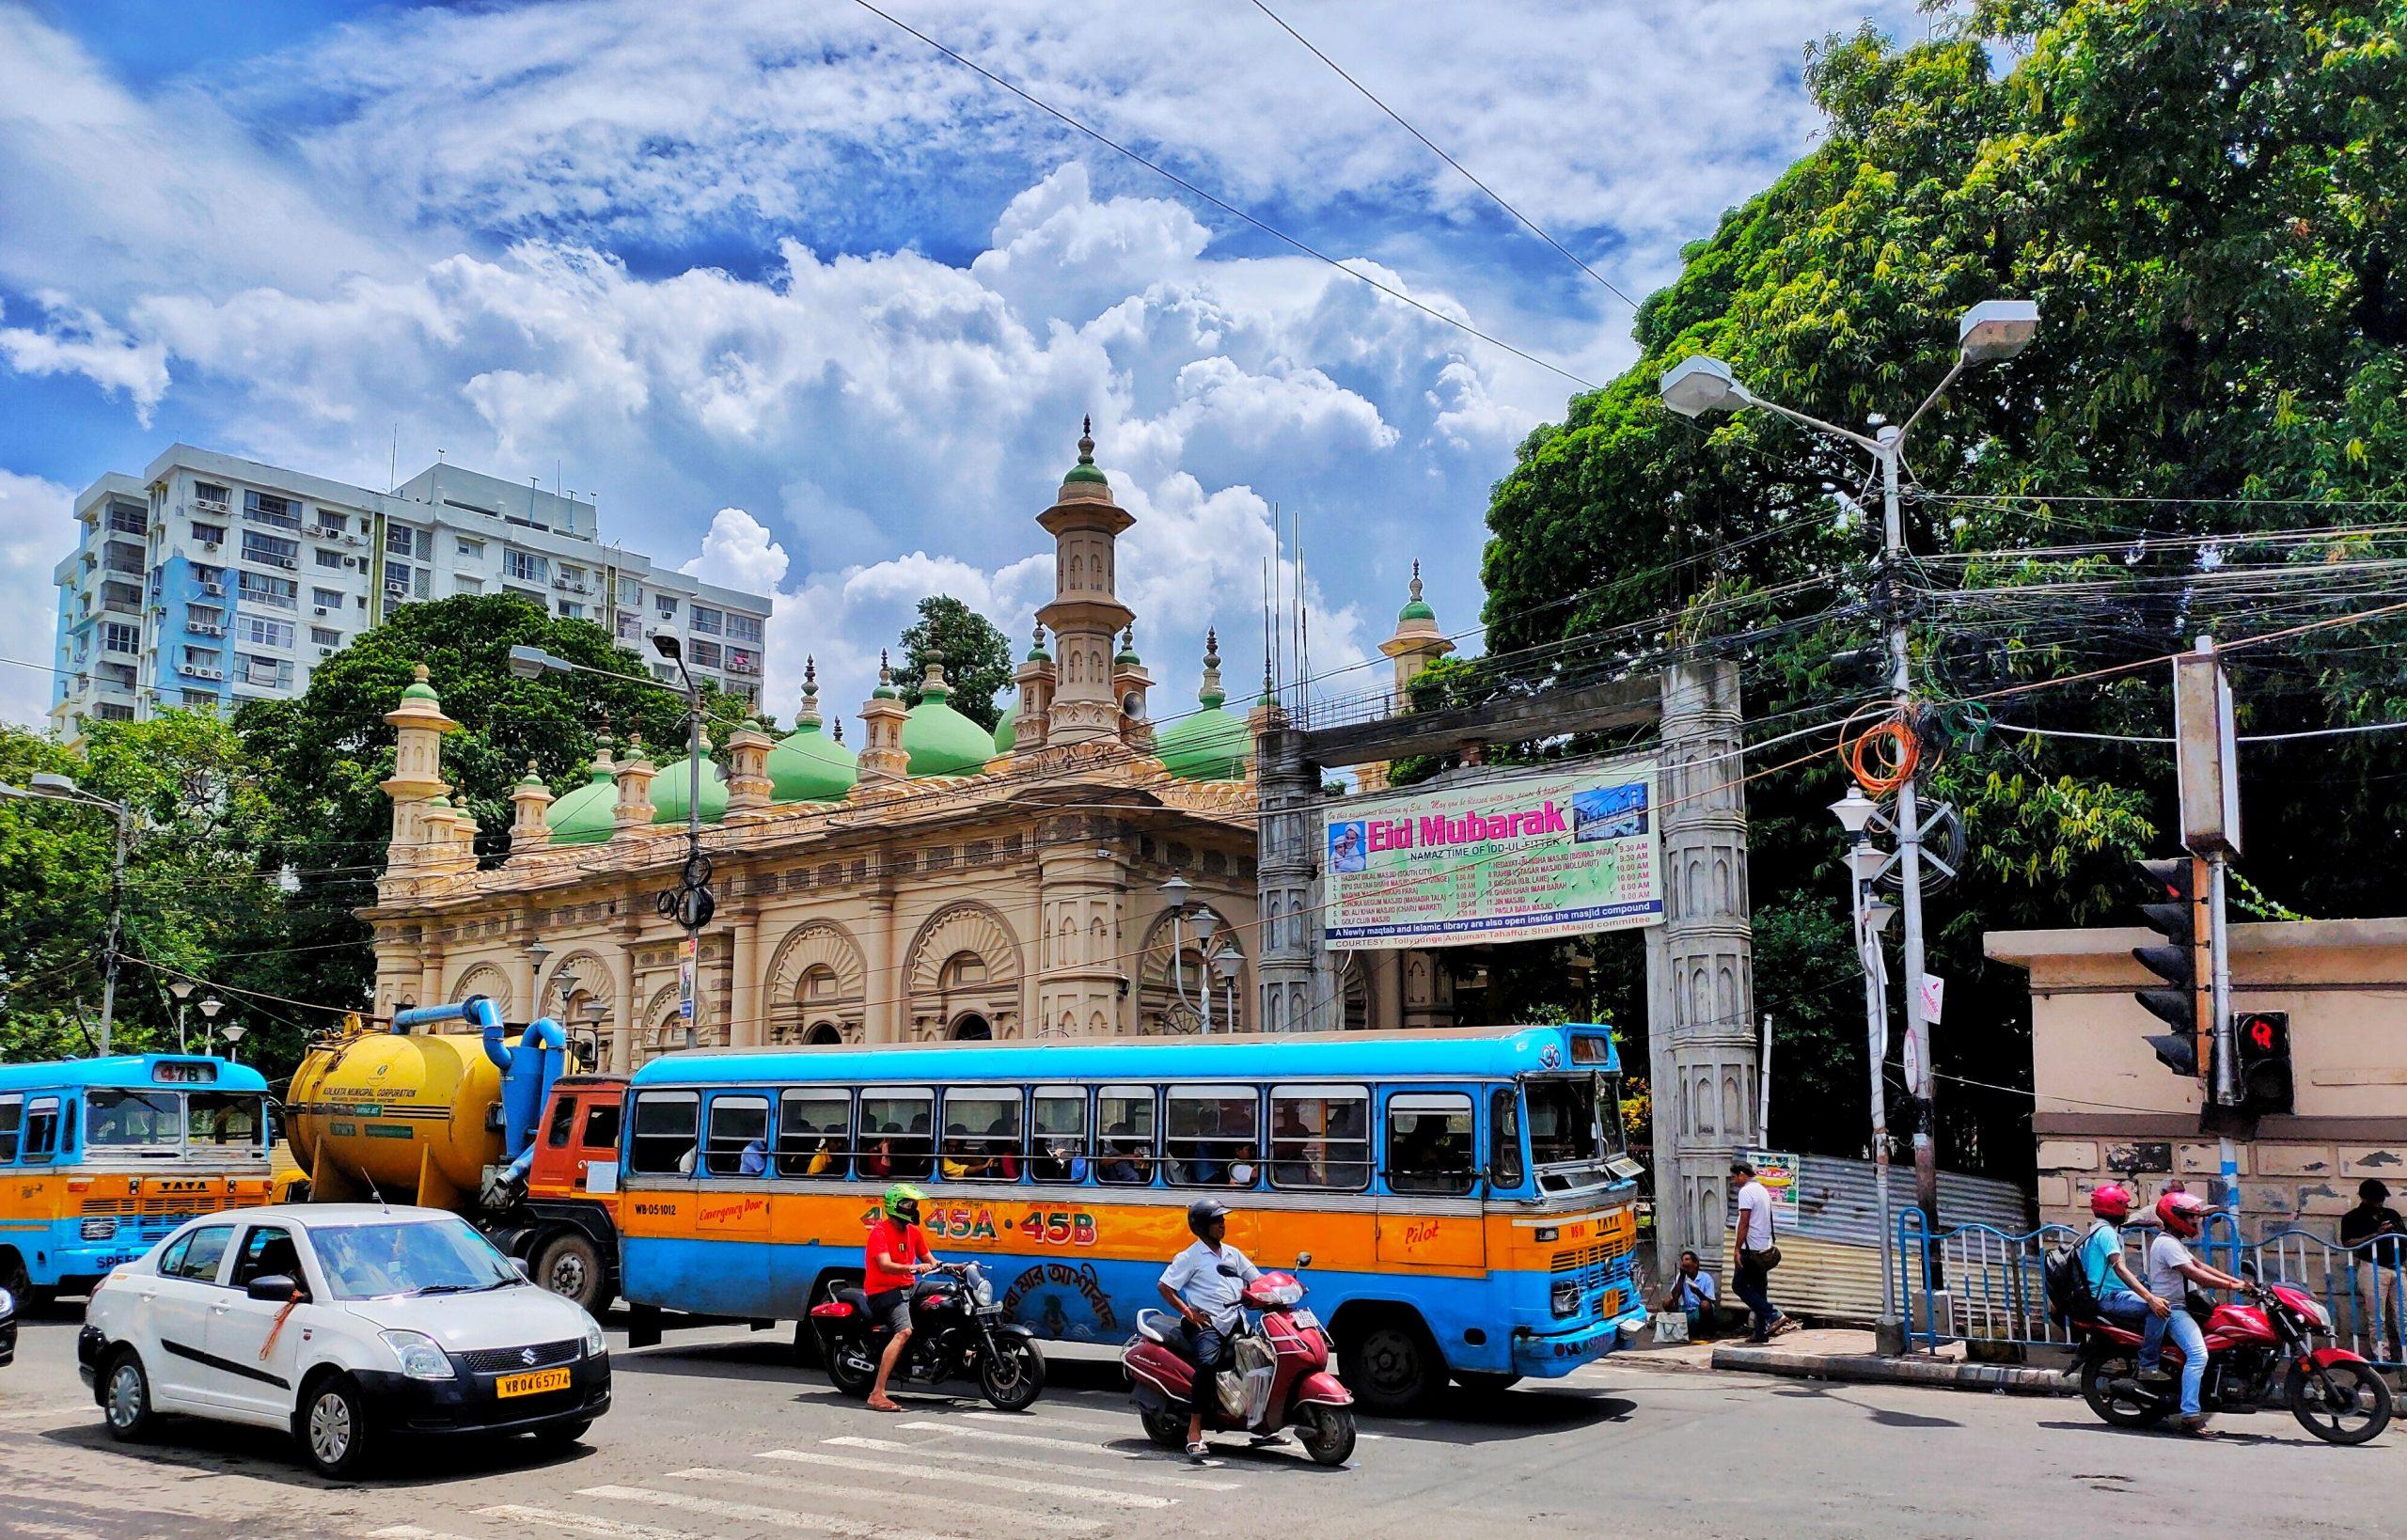 Traffic near Tipu Sultan mosque in Kolkata